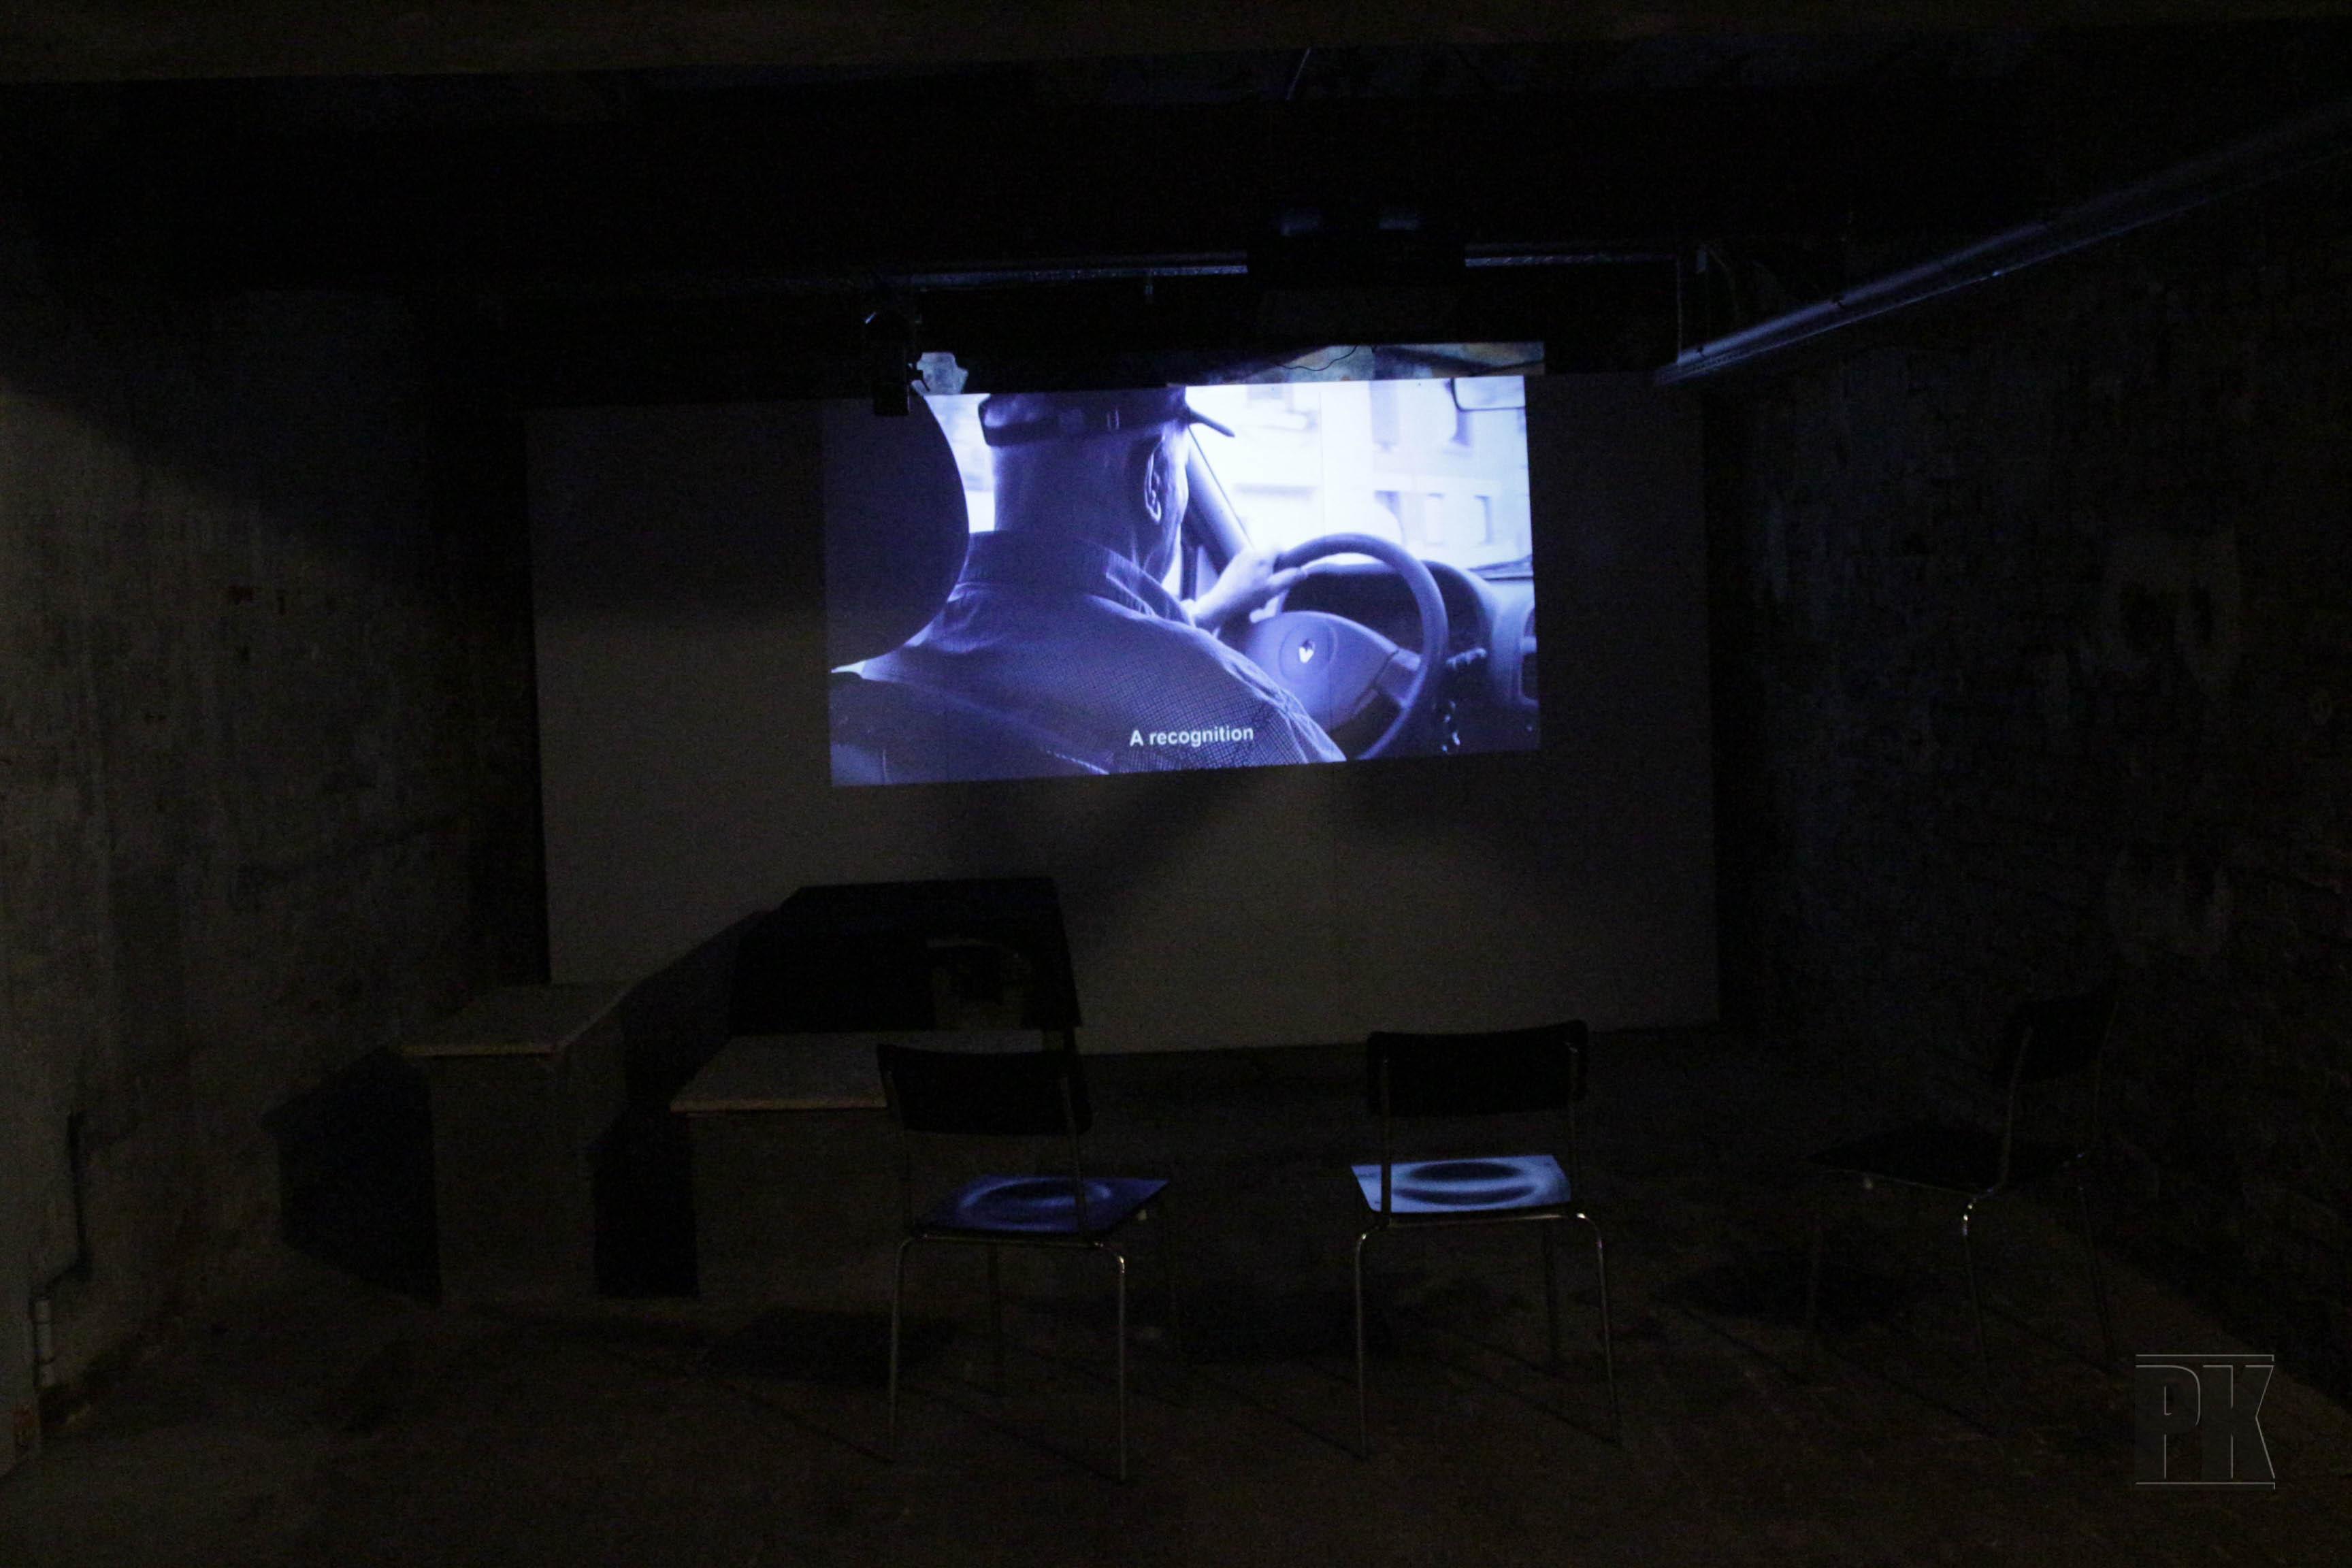 artist-work-Hungry-Dungeon-Friends-installation-view-PILOTENUECHE-International-Art-Program-at-KUNSTKRAFTWERK.-photo-Stanley-Louis-for-PK-45